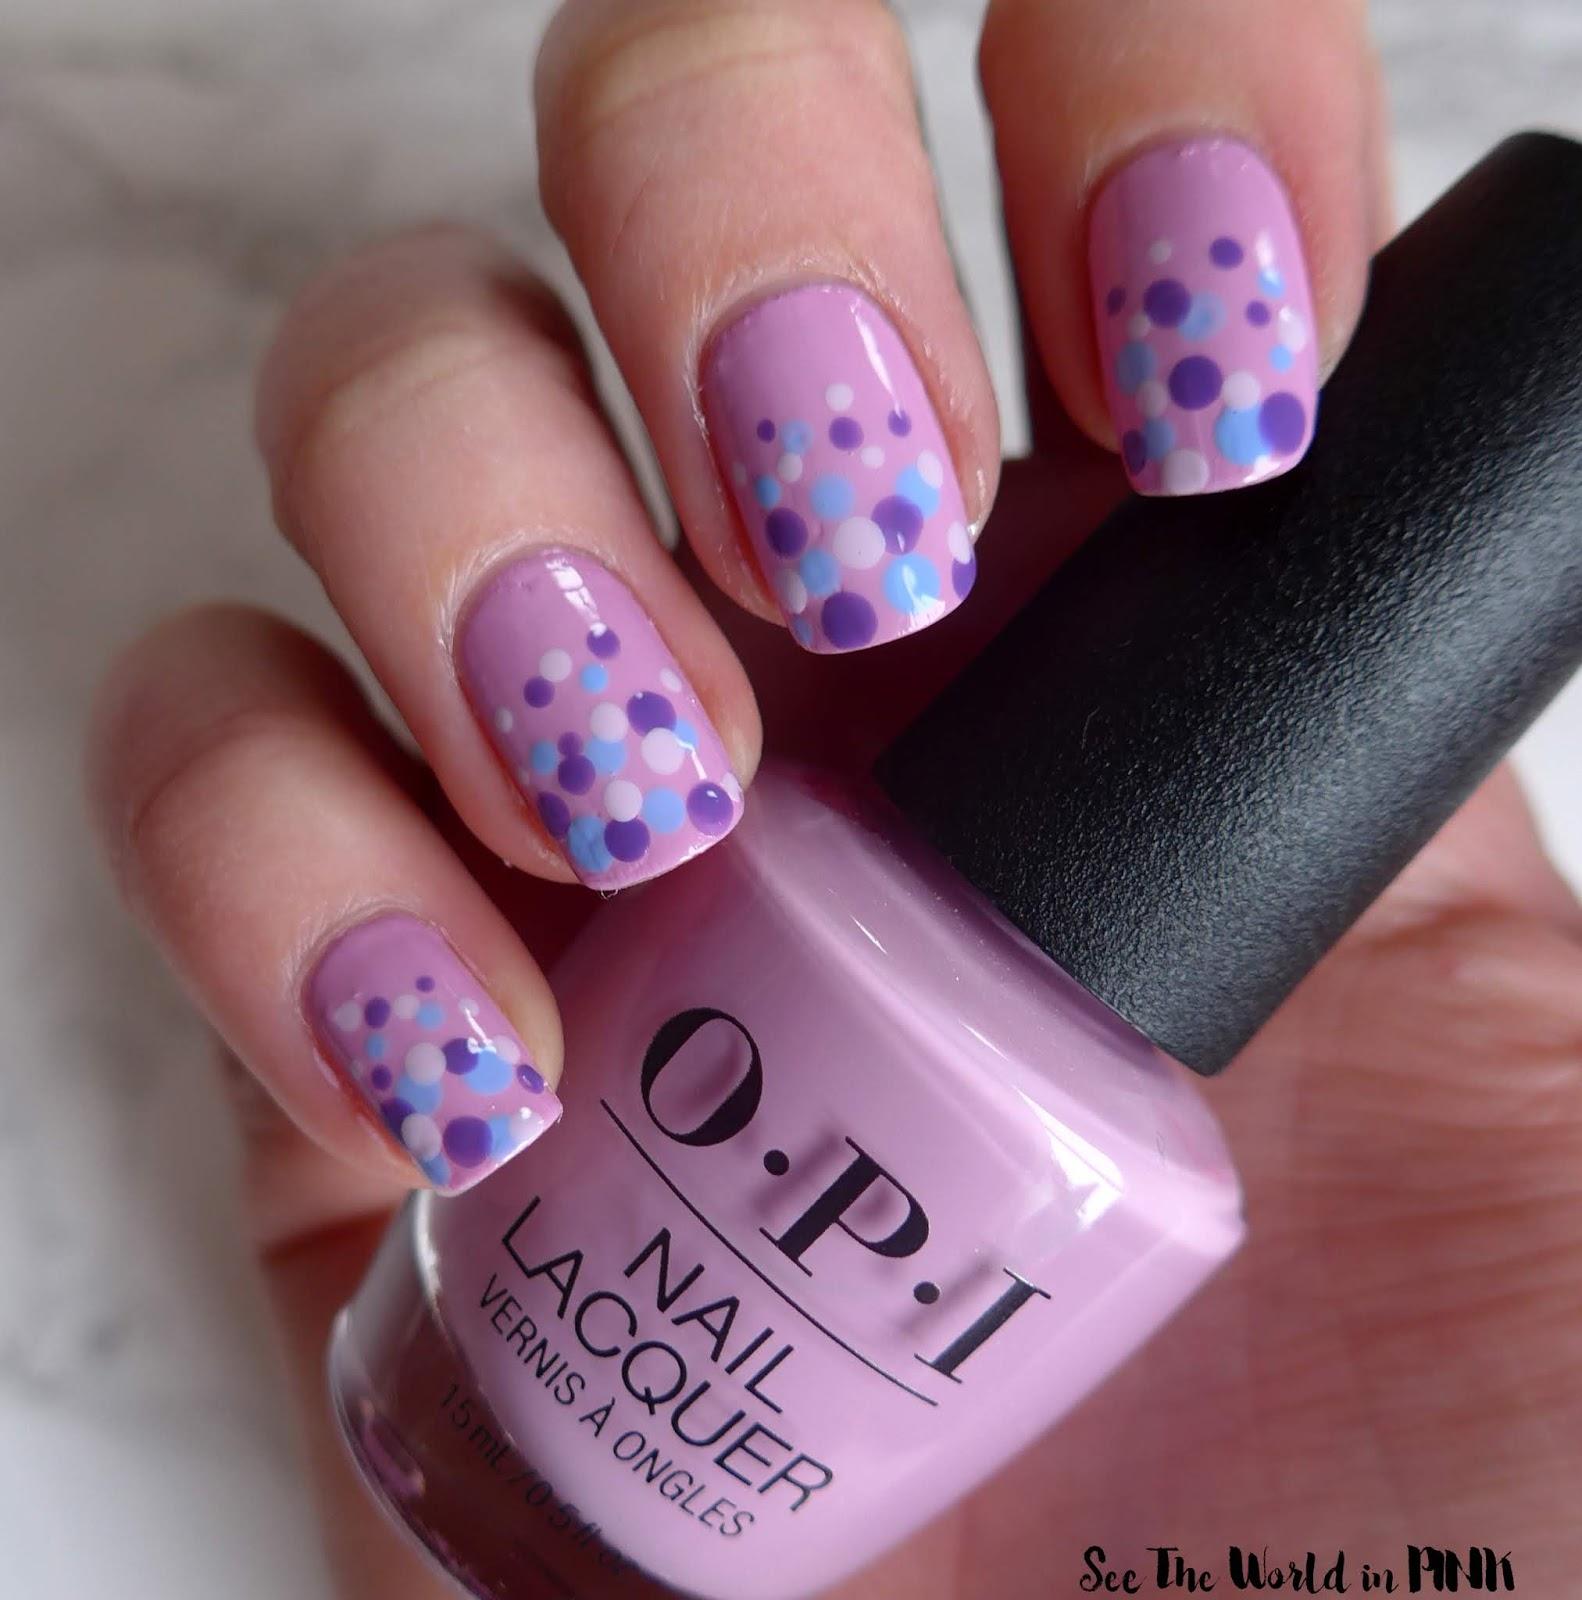 Manicure Monday - Easter Dotticure Nails